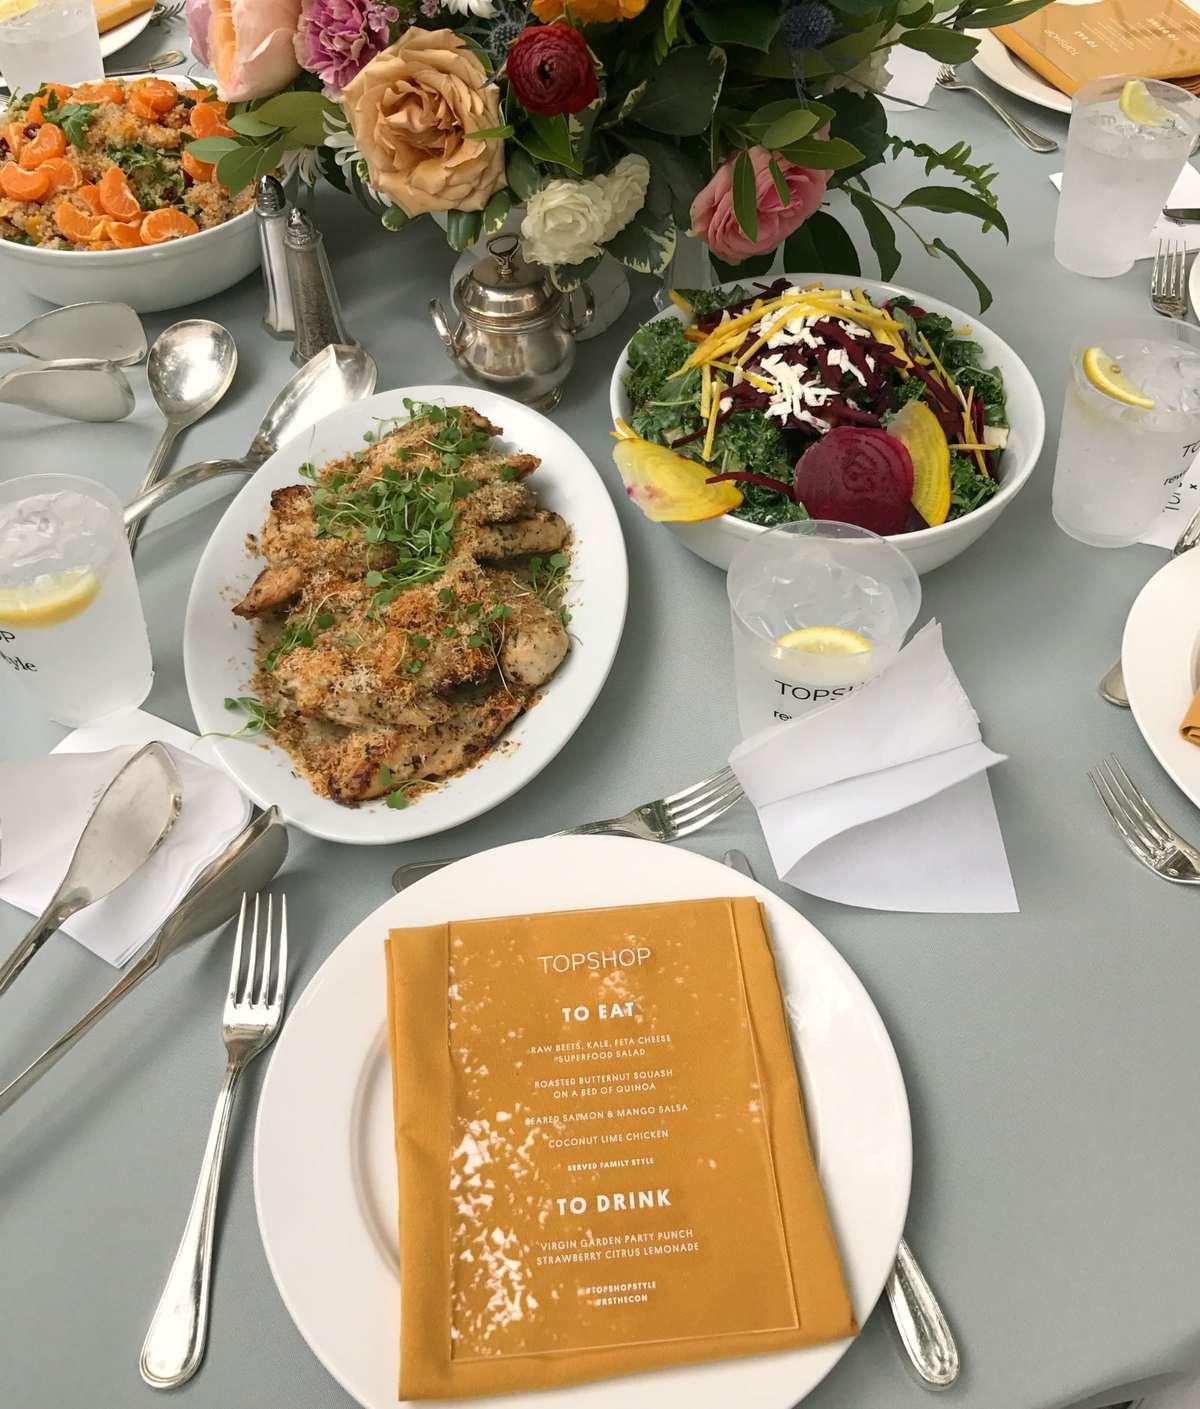 topshop garden lunch rewardstyle conference 2017